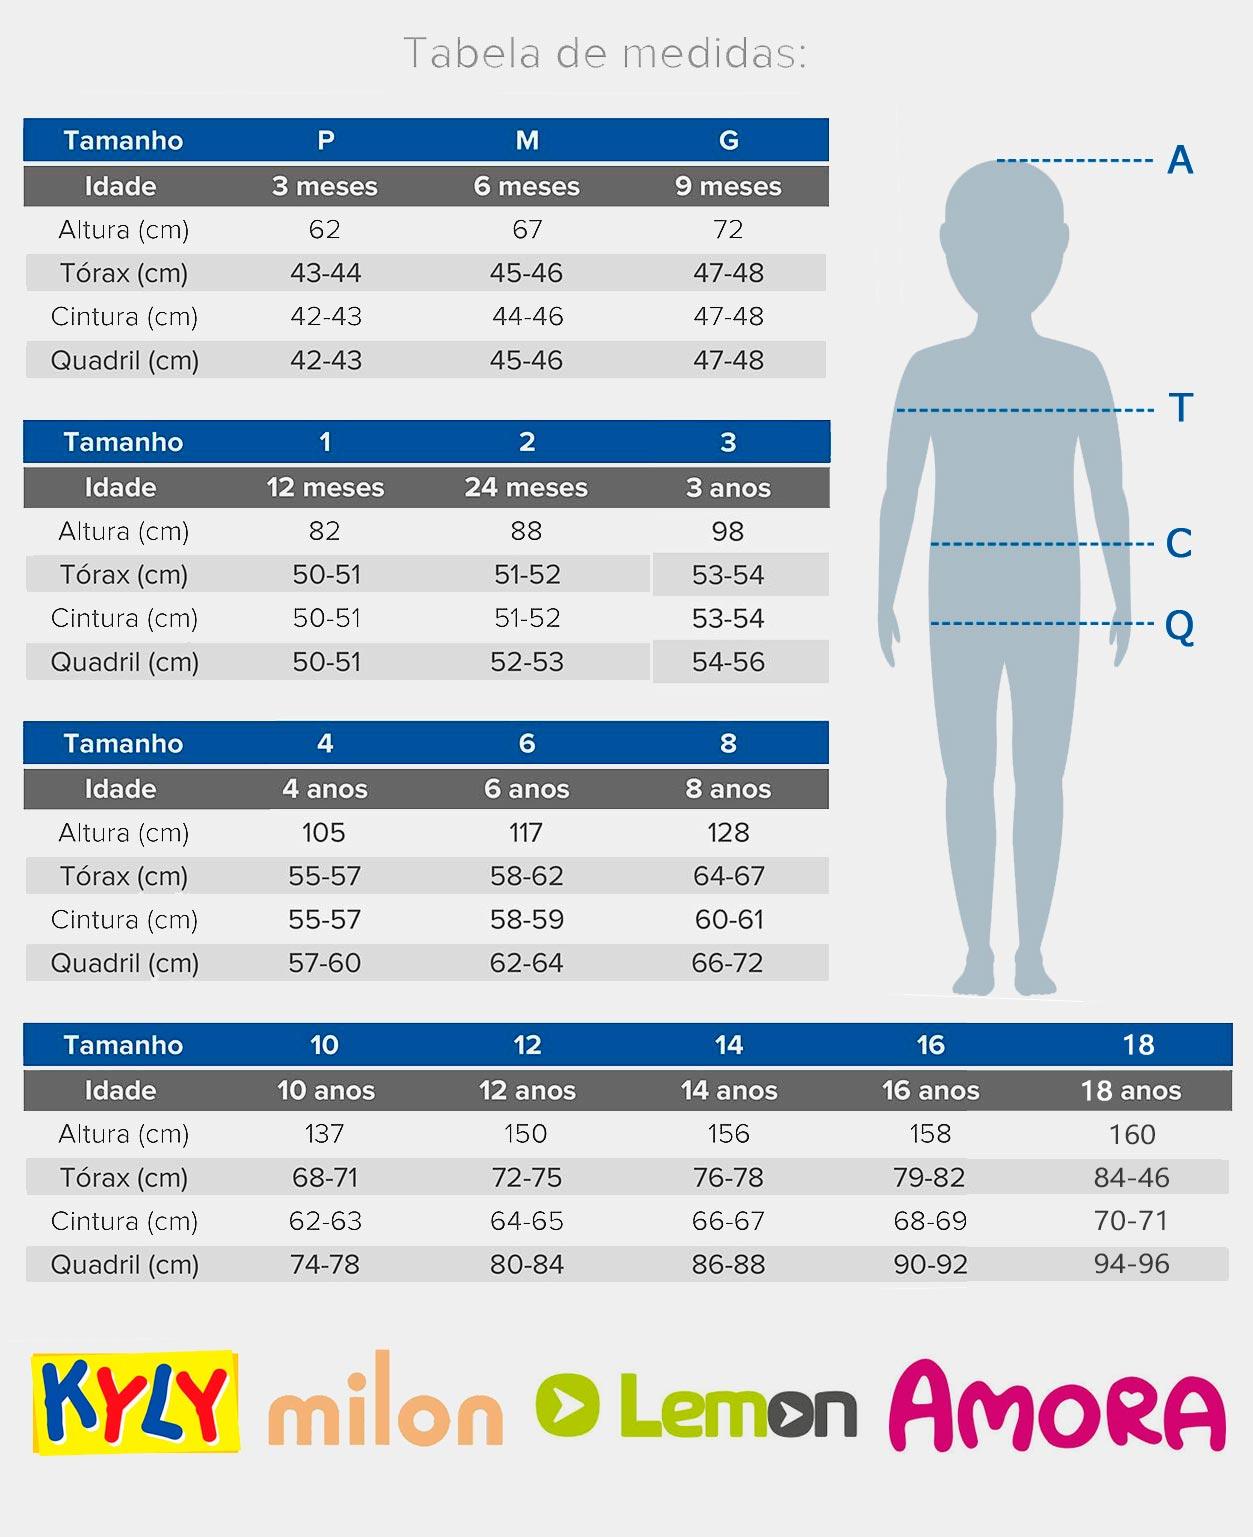 Conjunto Infantil Feminino Curto Preto Never Stop - Amora: Tabela de medidas